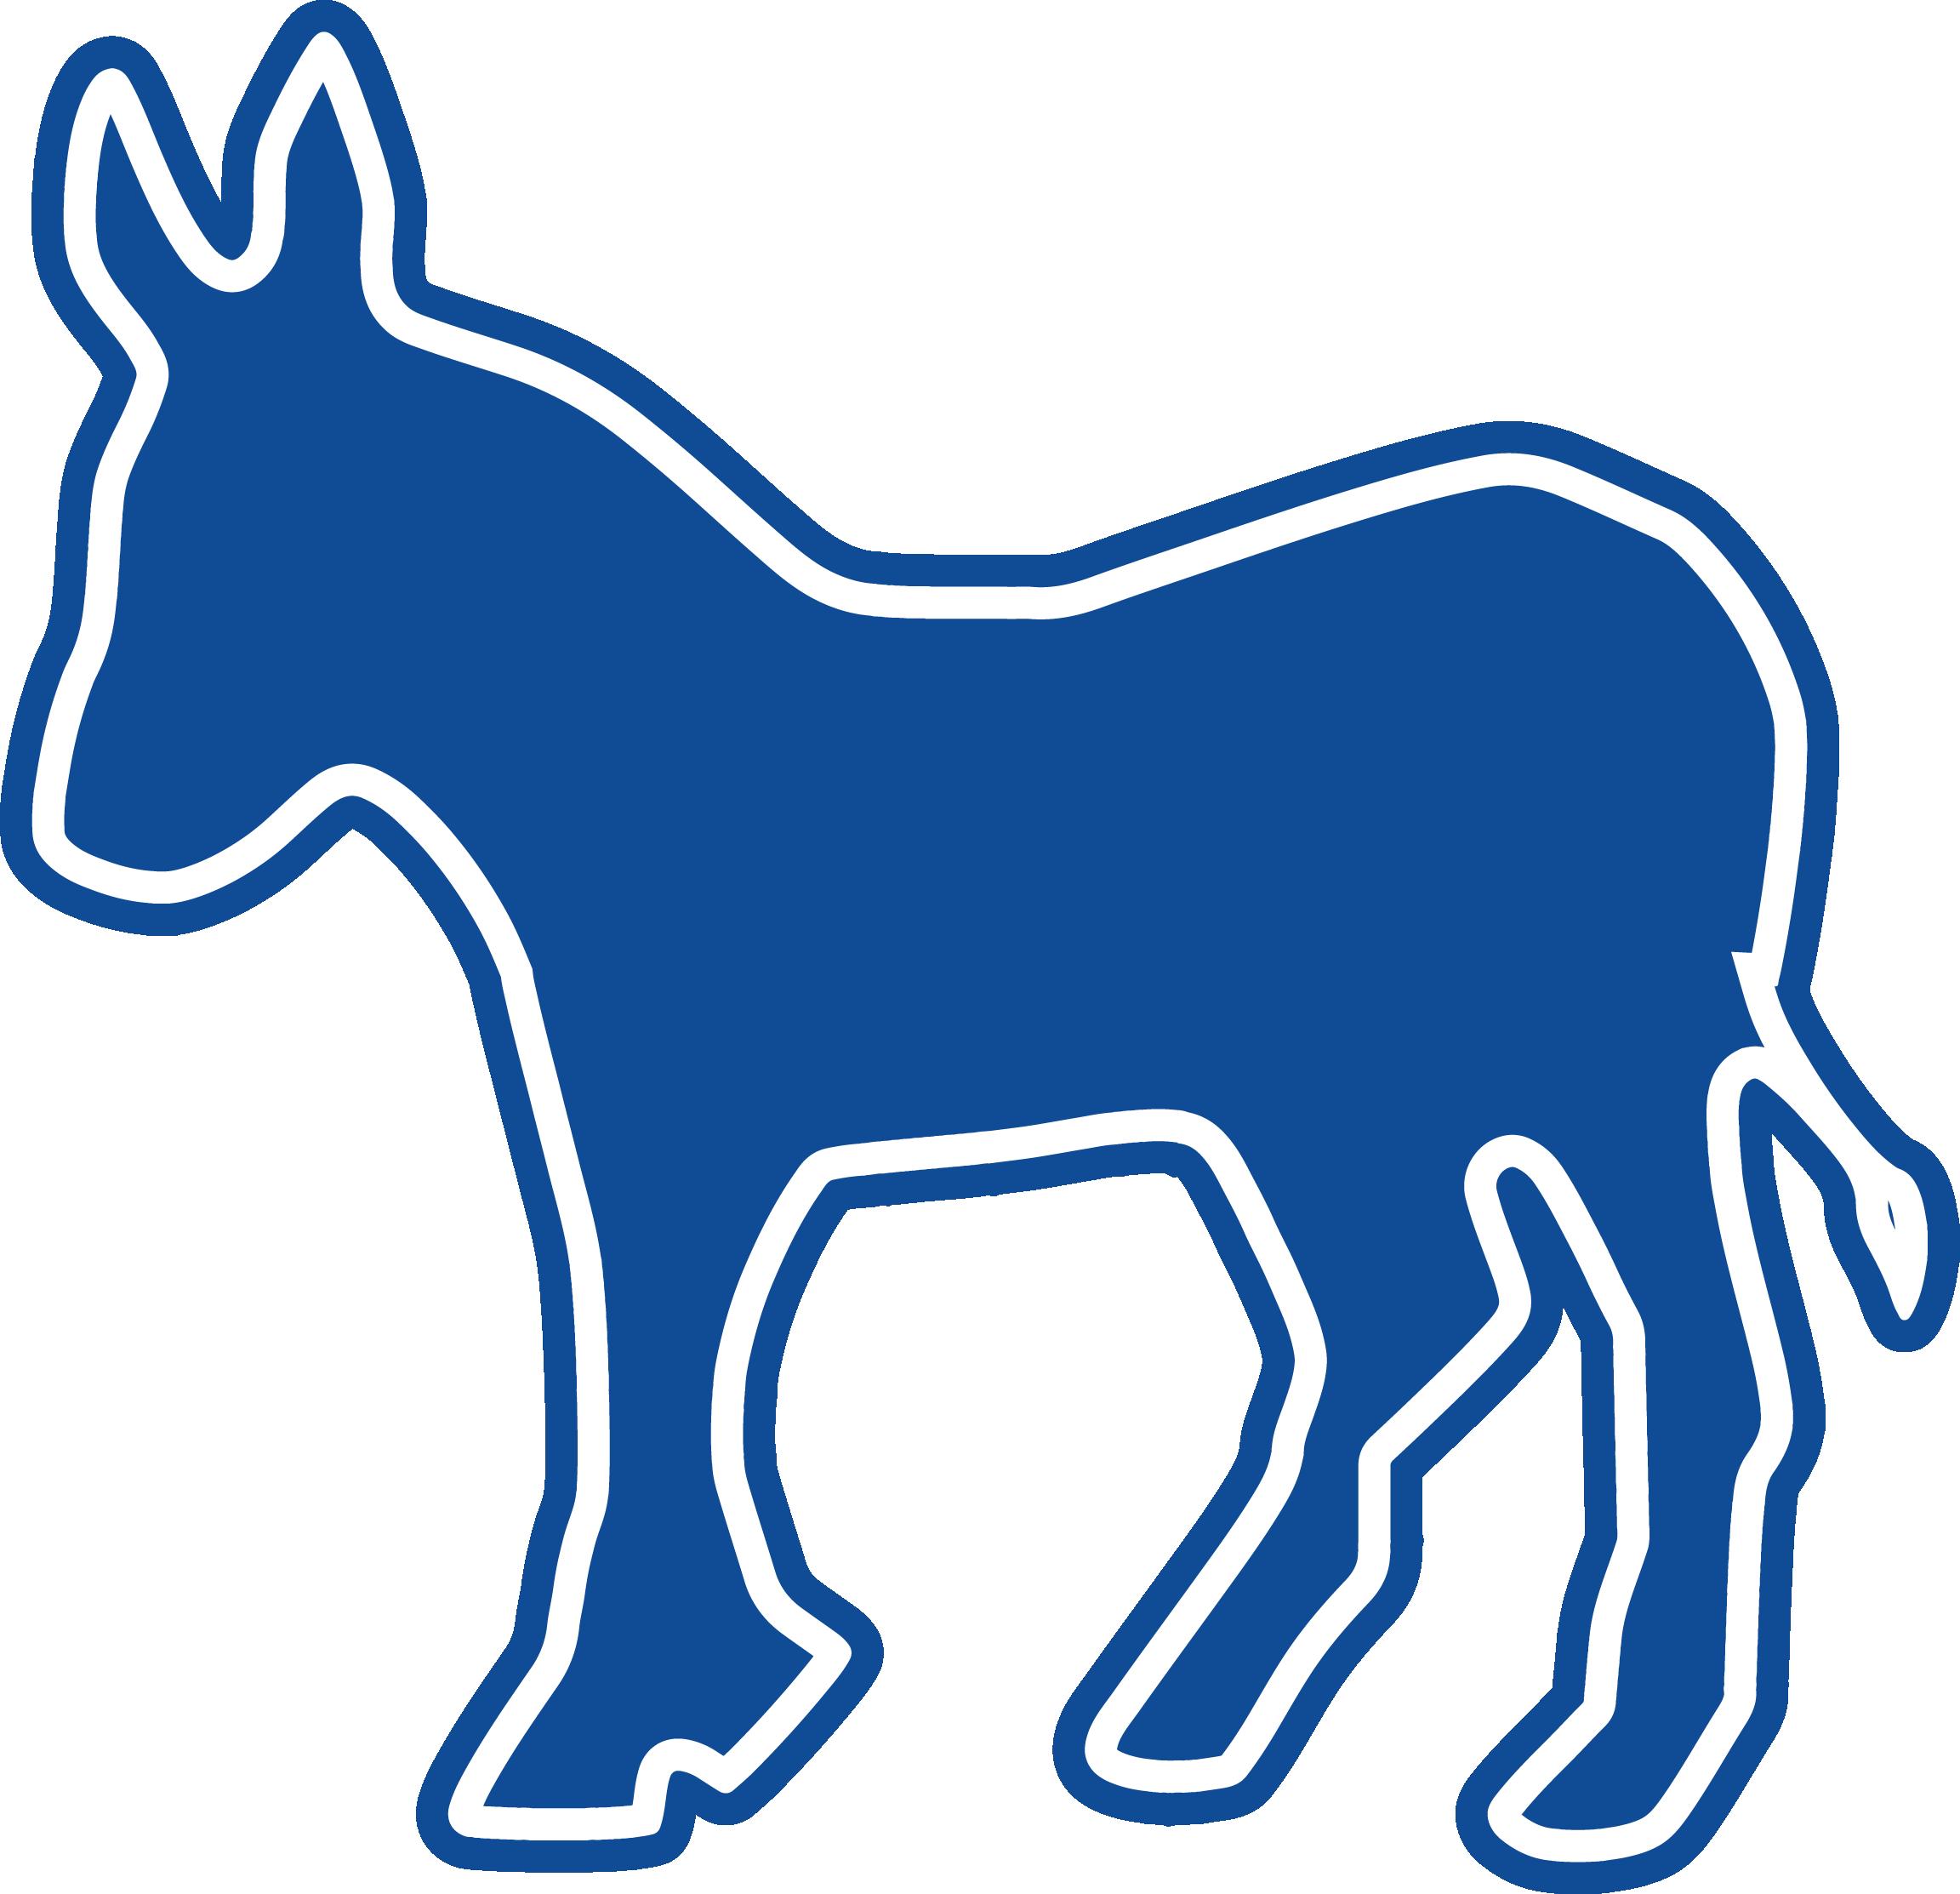 HD Bob Casey Democratic Party Transparent PNG Image Download.